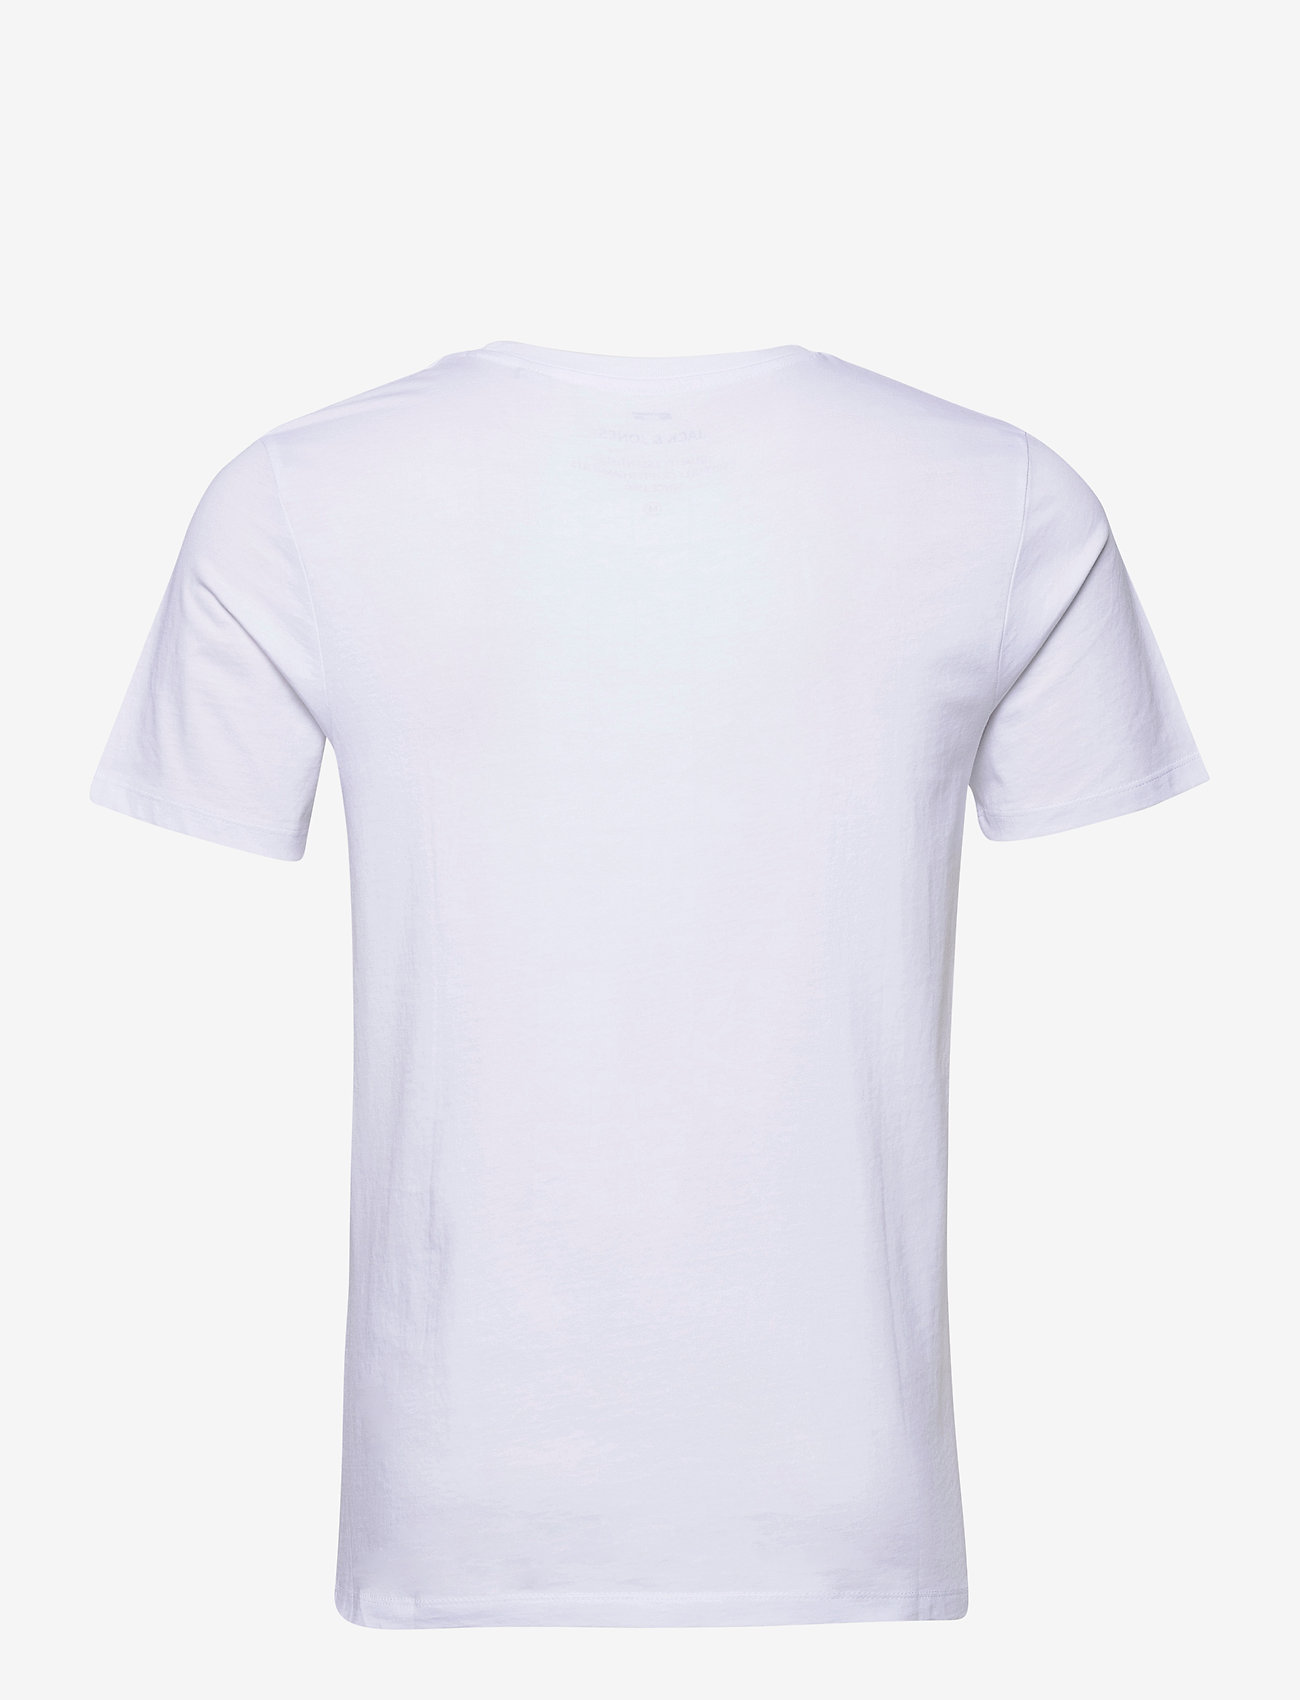 Jack & Jones - JJECORP LOGO TEE SS CREW NECK 3PK MP - kortärmade t-shirts - white - 1